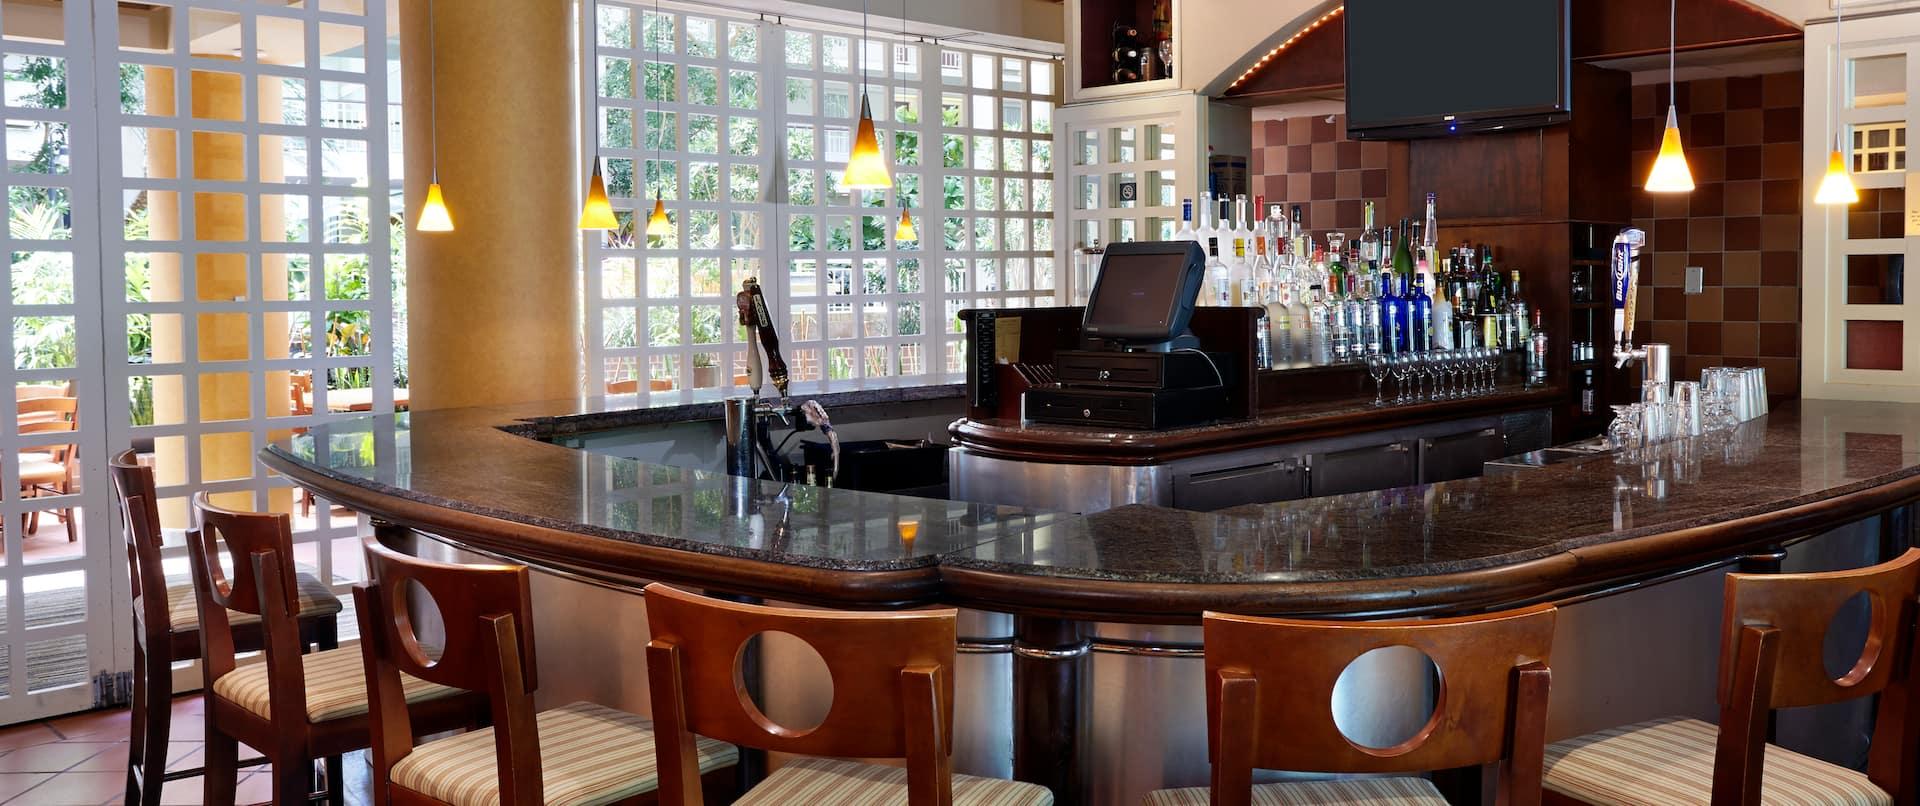 Bar Seats